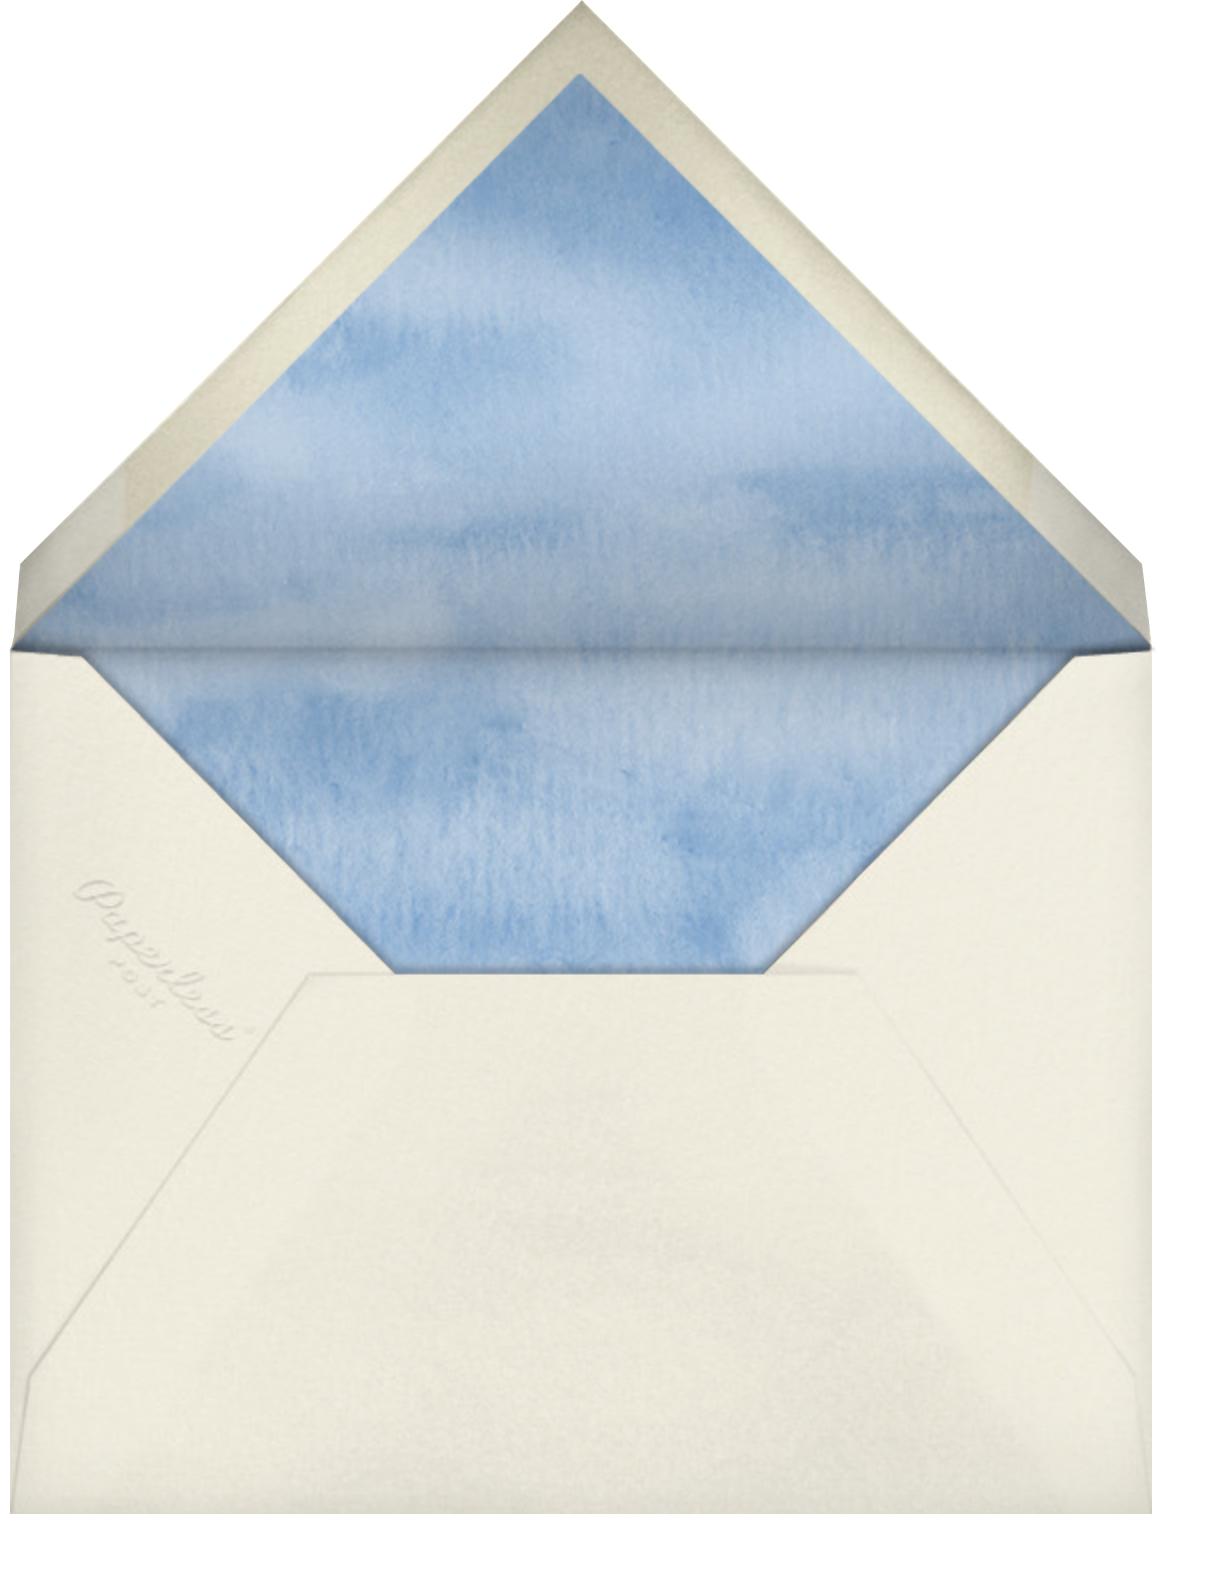 Built for Two (Photo) - Felix Doolittle - Felix Doolittle - envelope back